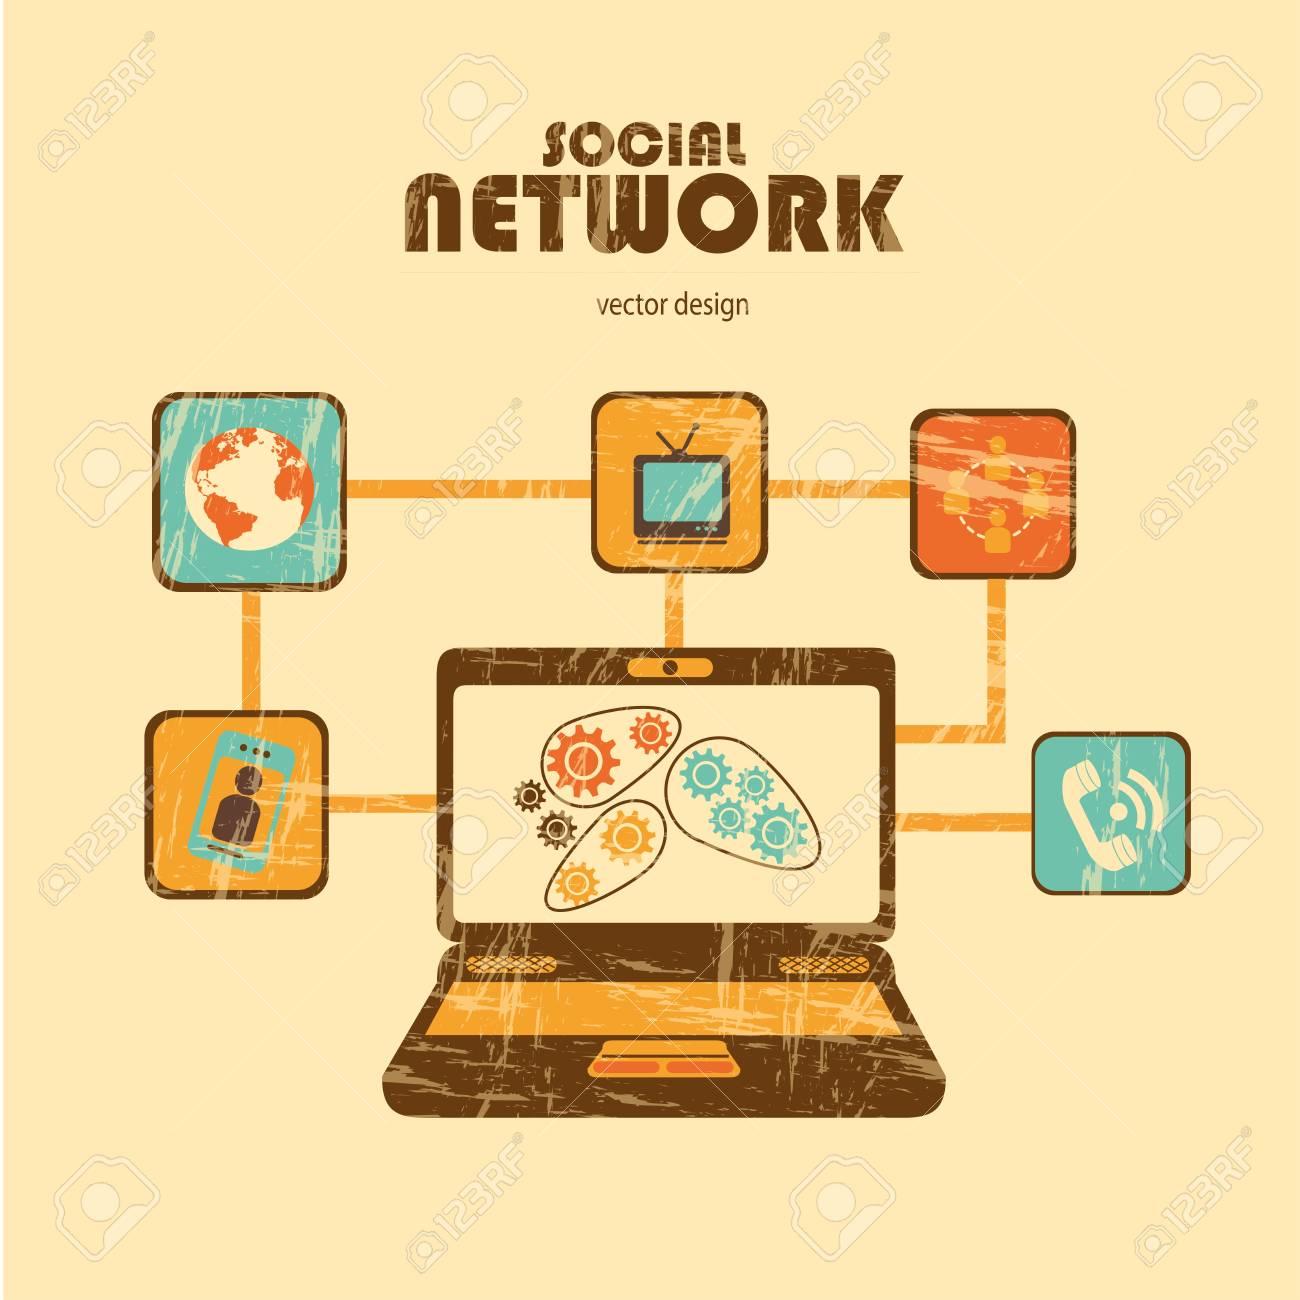 social network over cream  background Stock Vector - 21679167